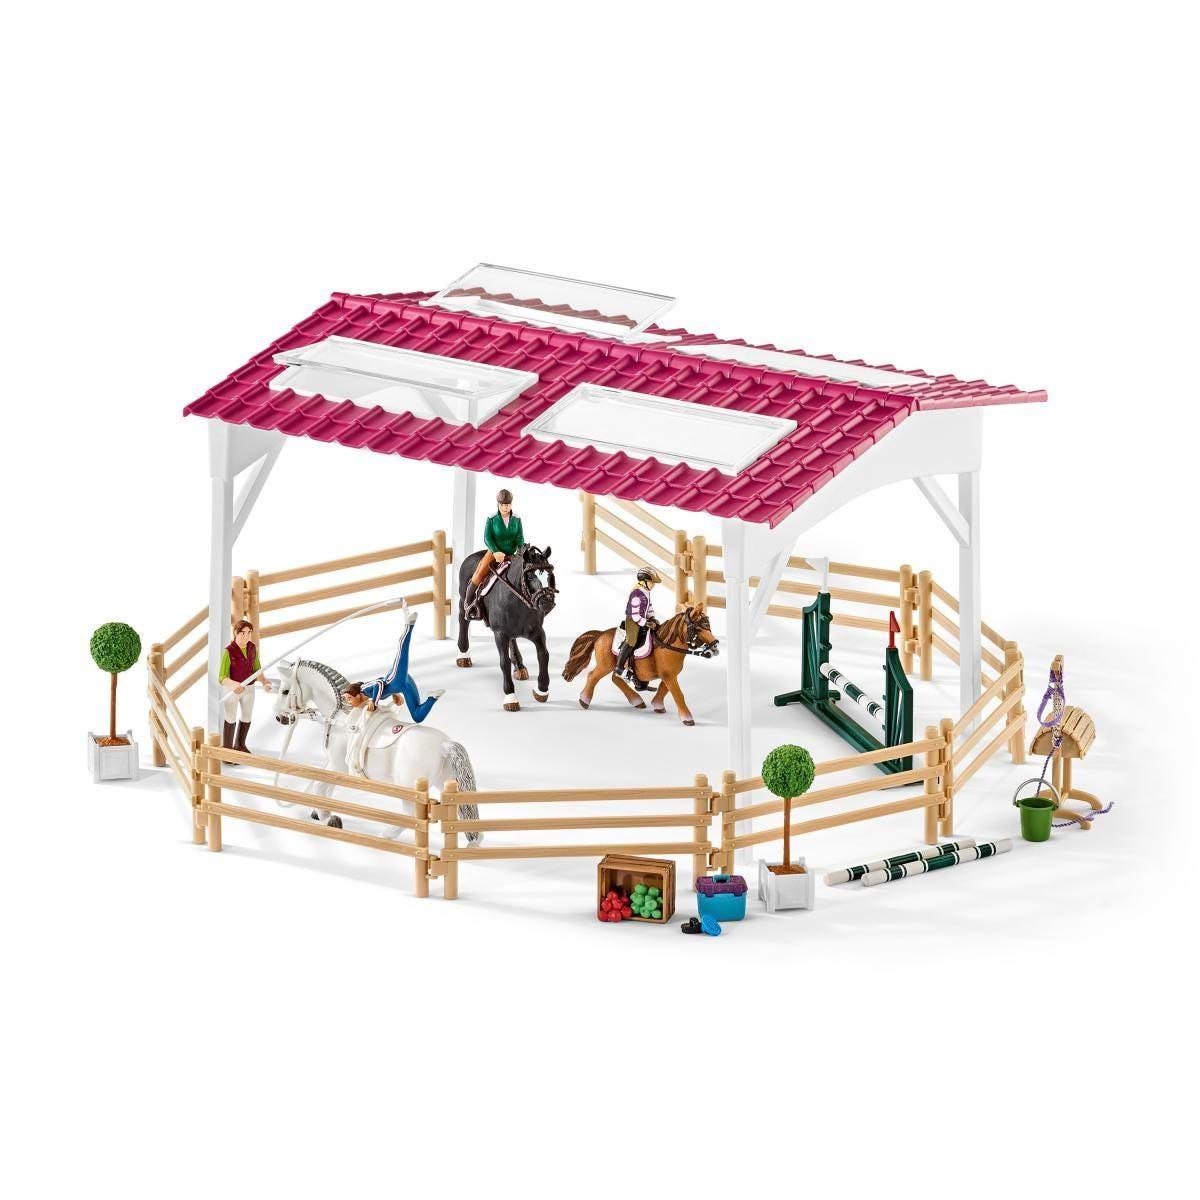 1745461-Schleich-Horse-Club-42389-set-di-action-figure-giocattolo-SCHLEICH-Hors